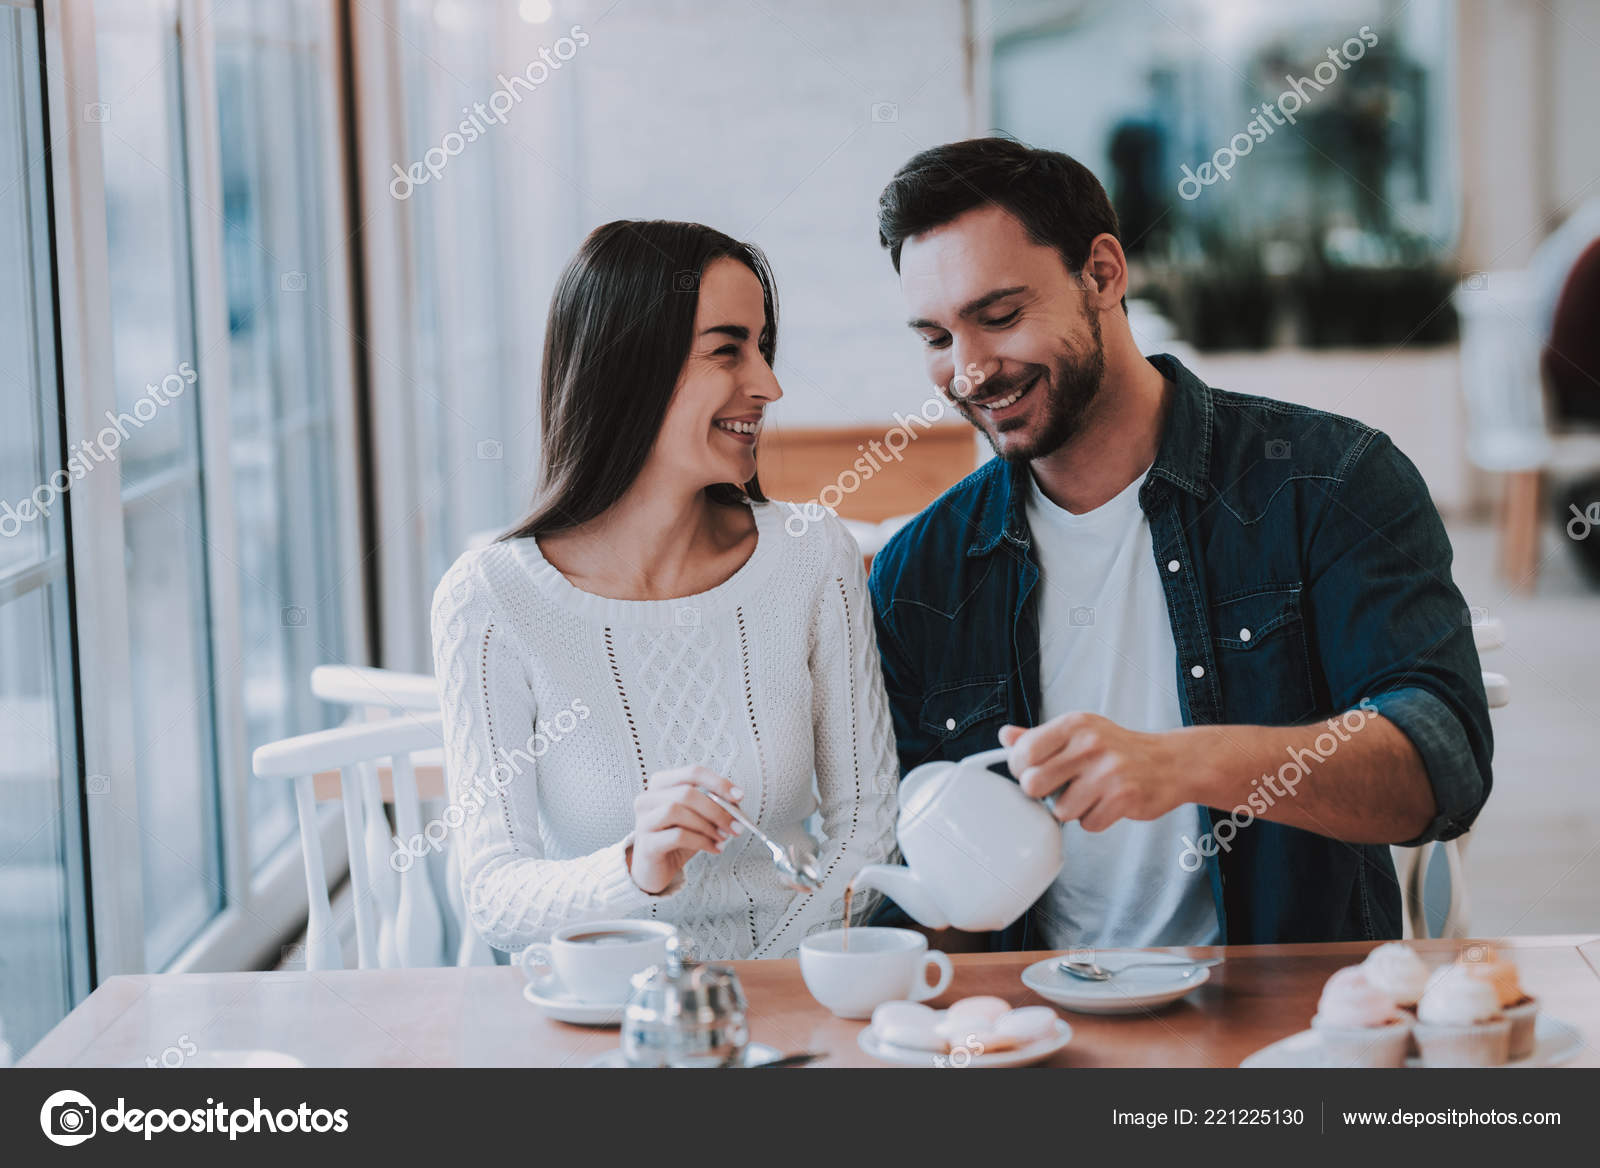 Cattivo ragazzo dating buona ragazza